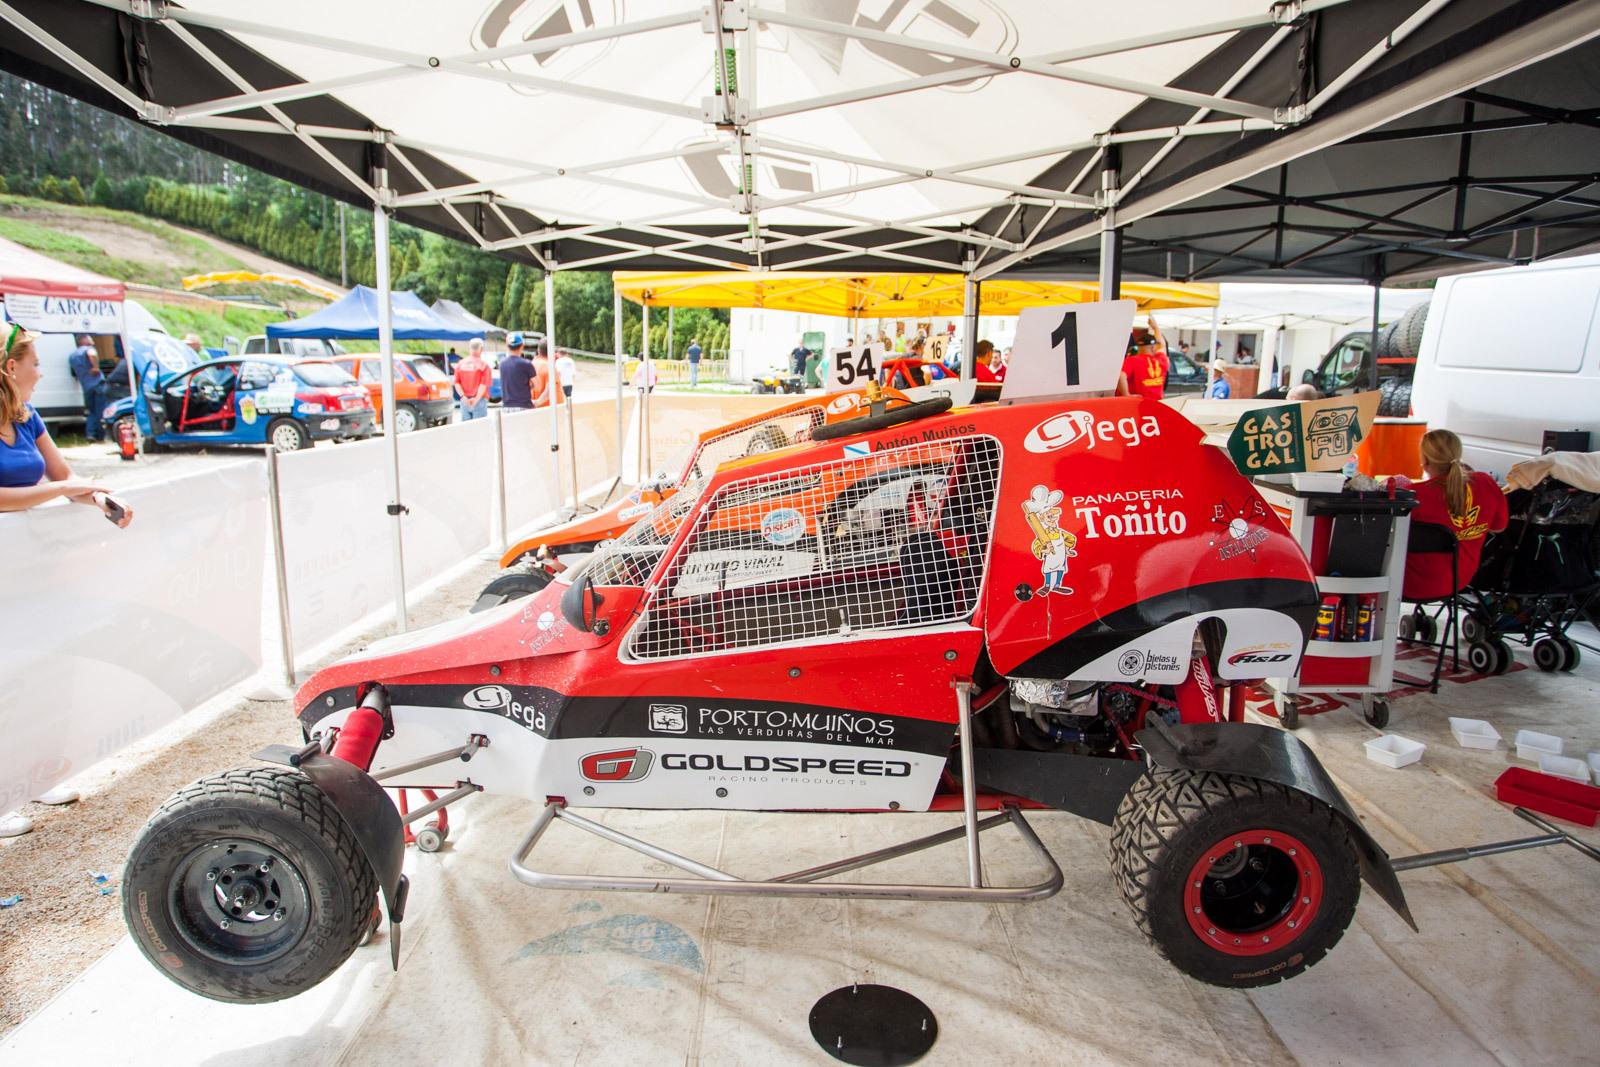 006 Autocross Carballo RFEDA 2016 005